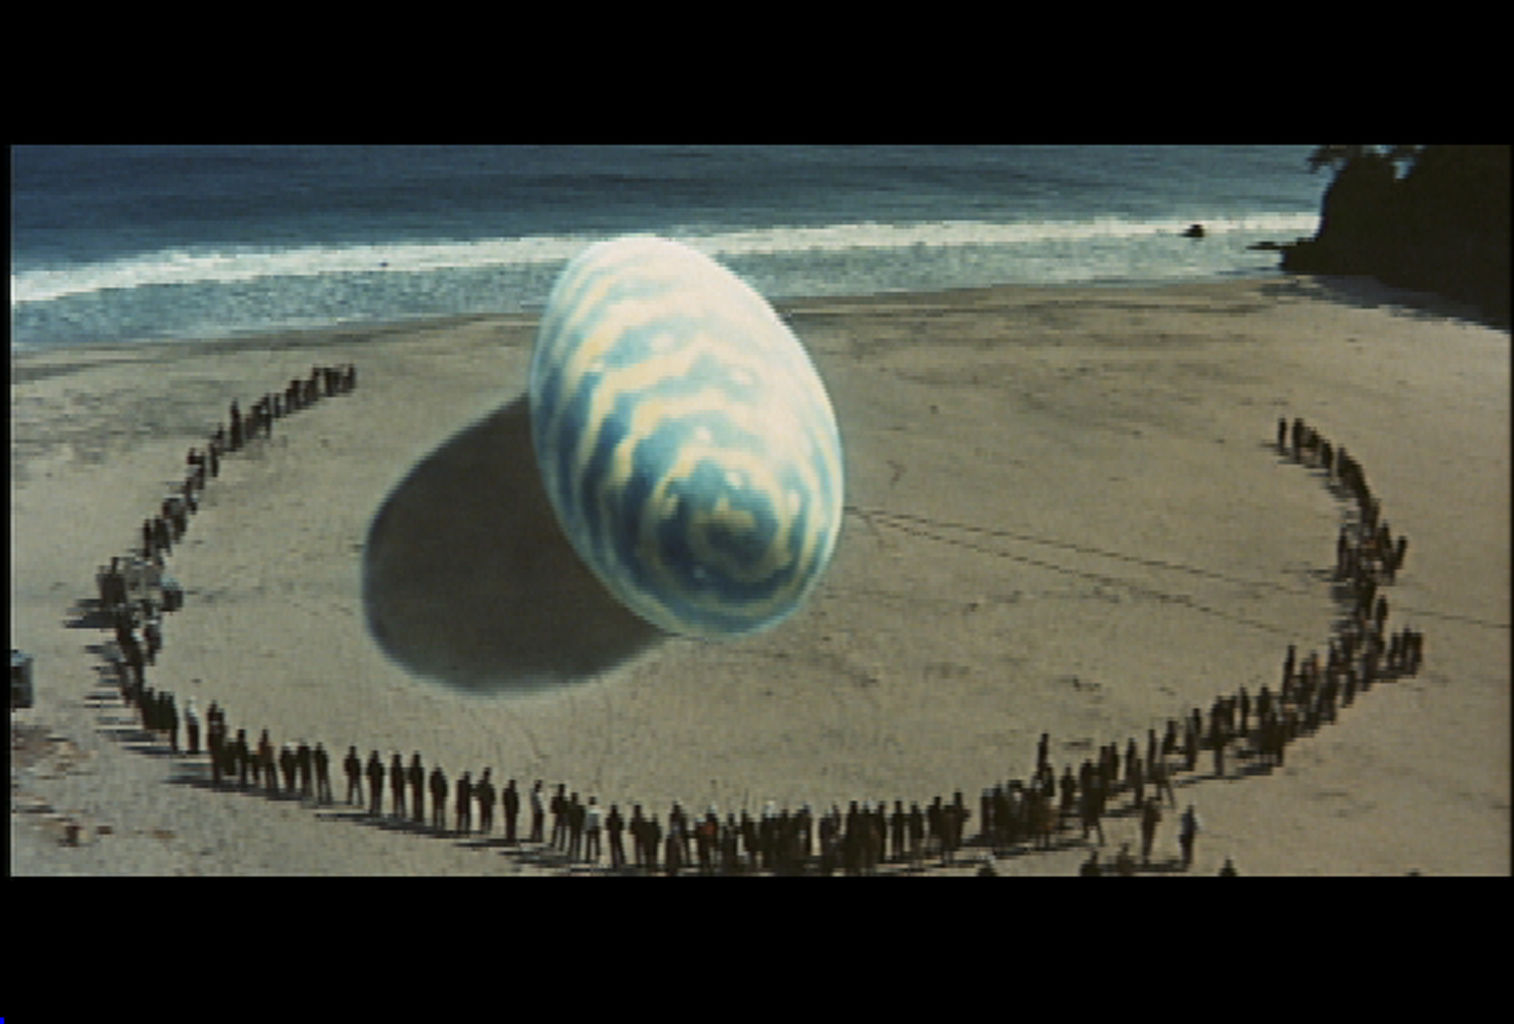 El gigantesco huevo